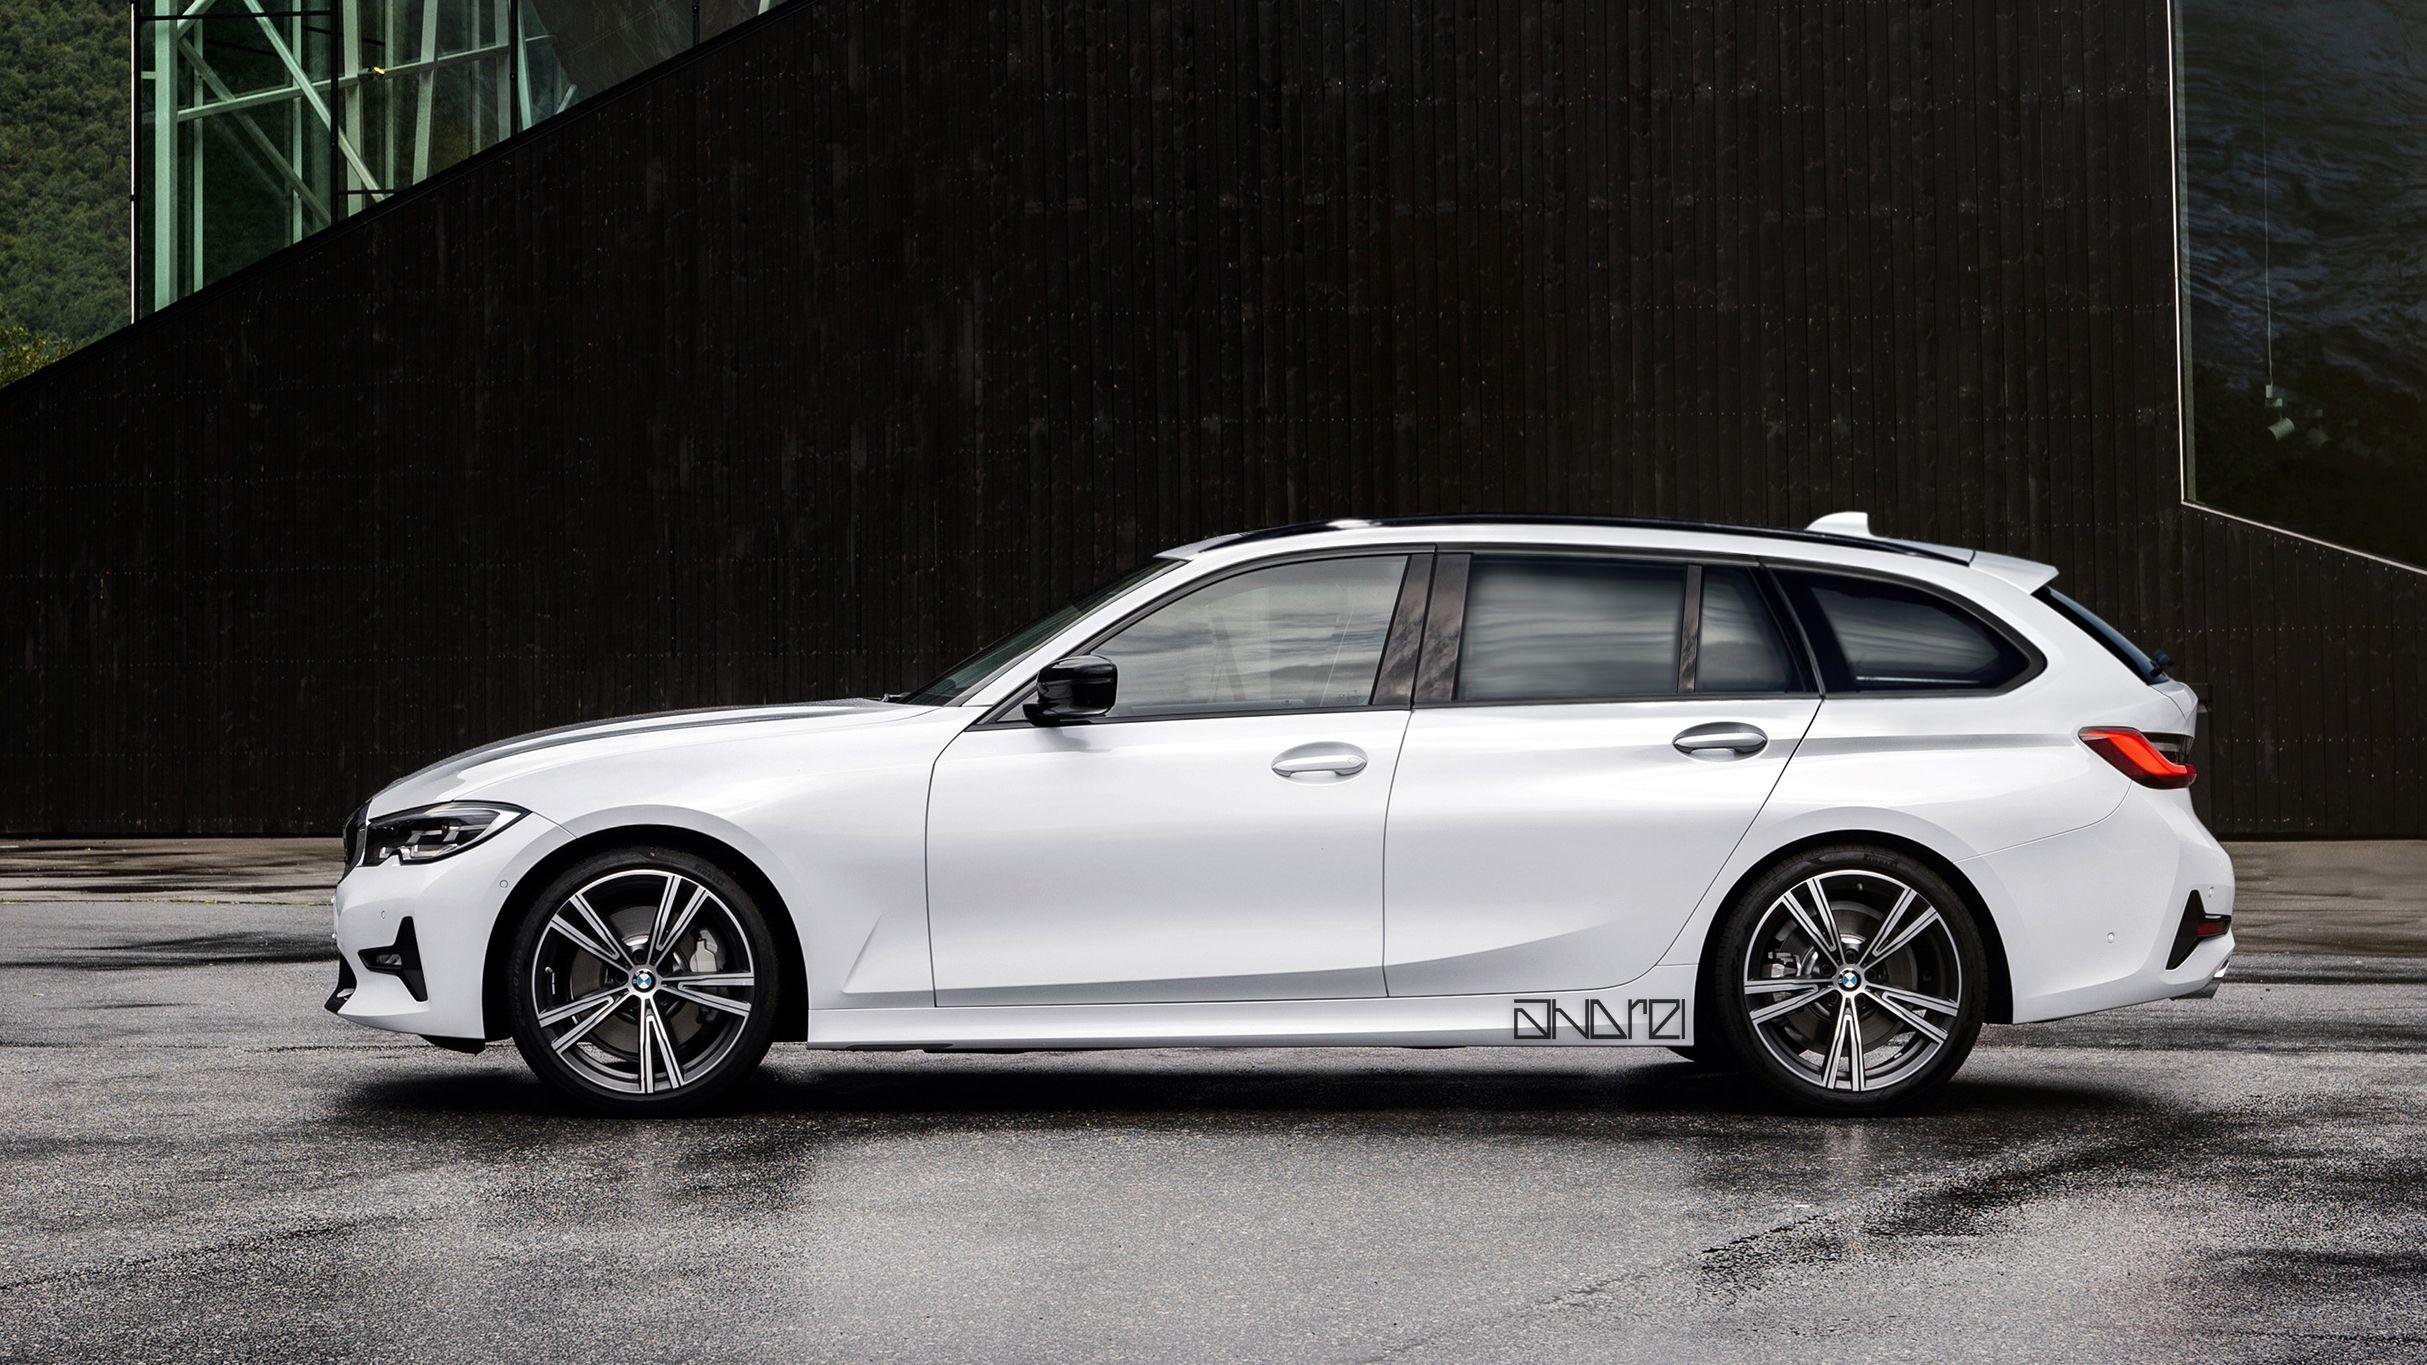 2020 Bmw 3 Series Touring Rendered Bmw Wagon Bmw Touring Bmw